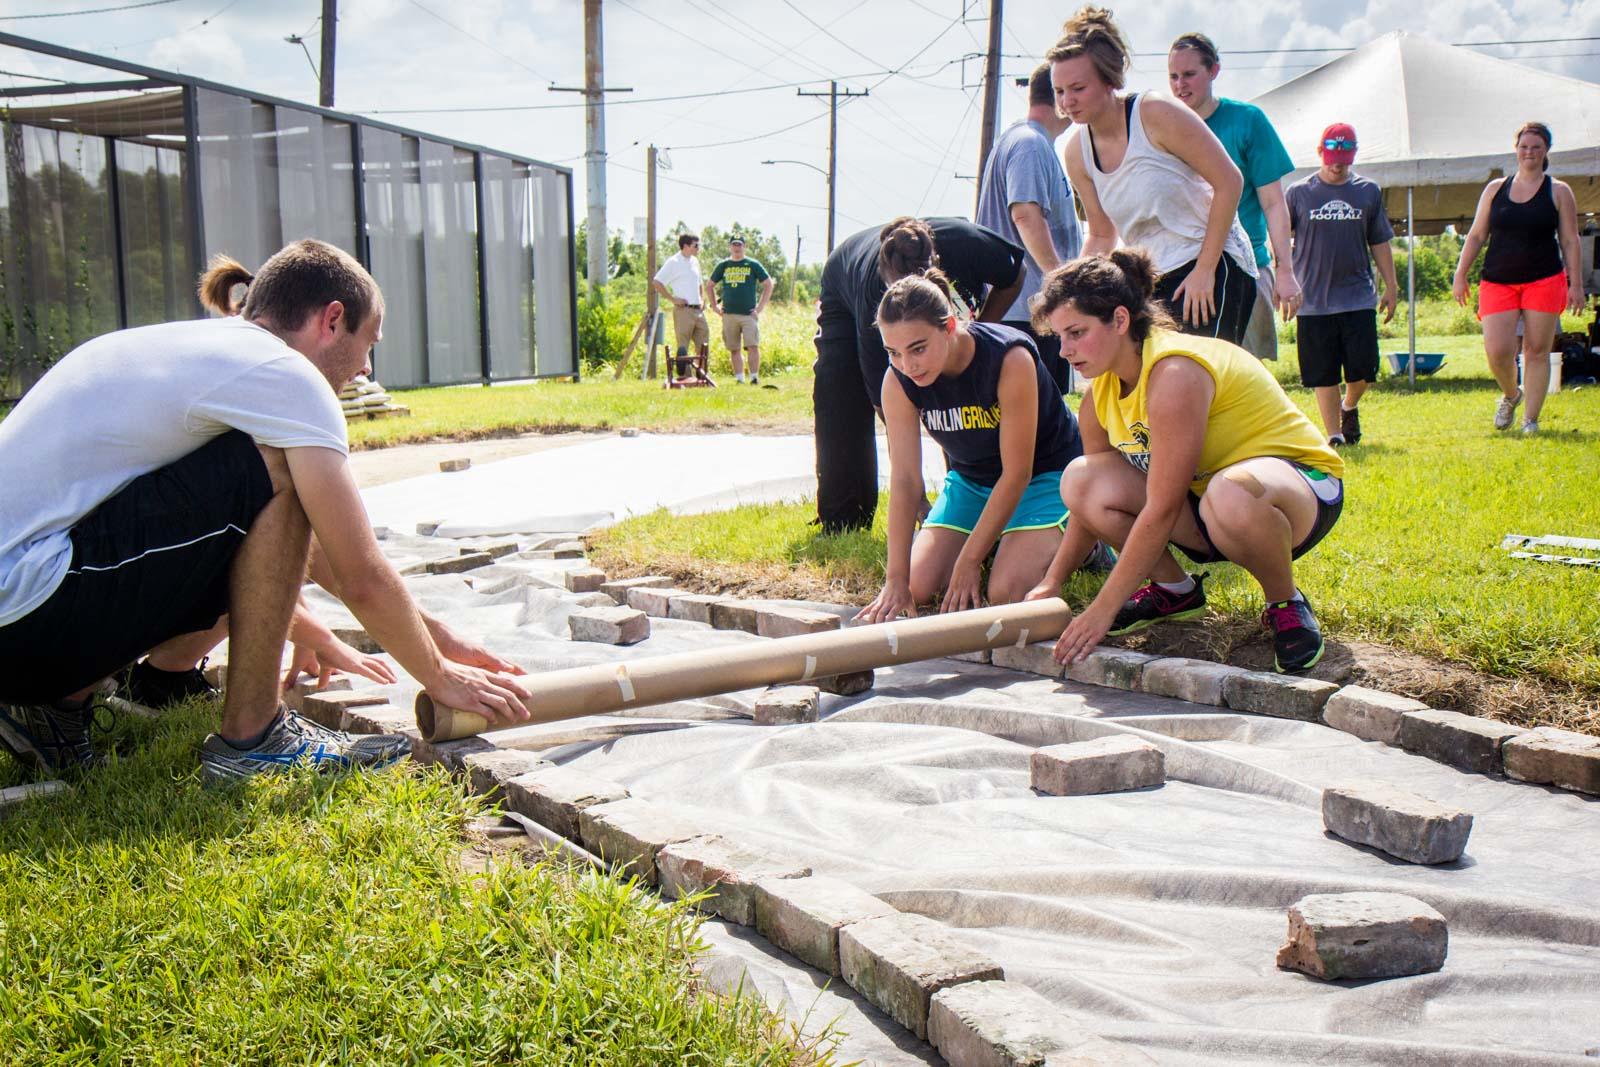 Volunteer in New Orleans, Camp Restore, Hurricane Katrina